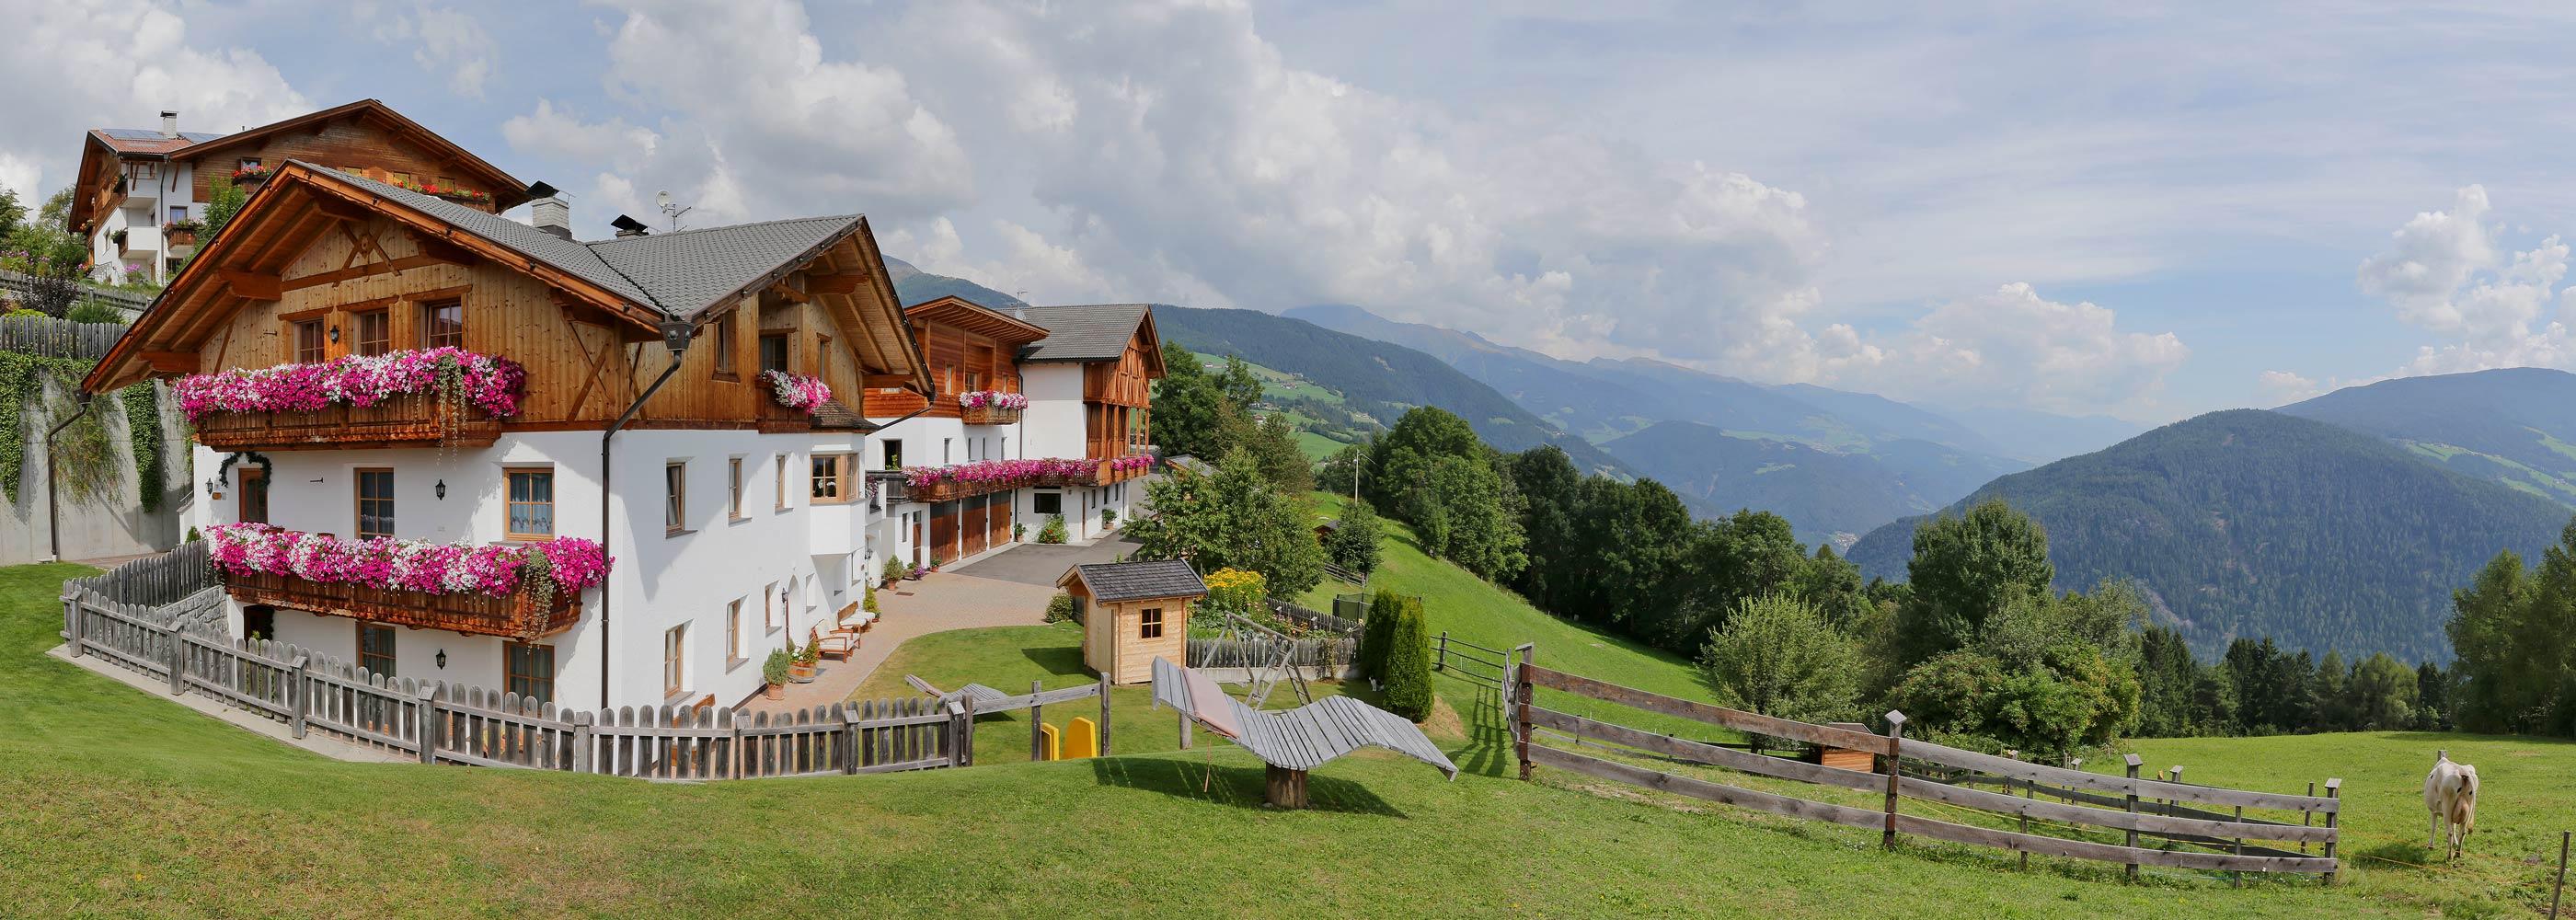 bauernhof-meransen-gitschberg-jochtal-maso-agriturismo-maranza-farm-vacation